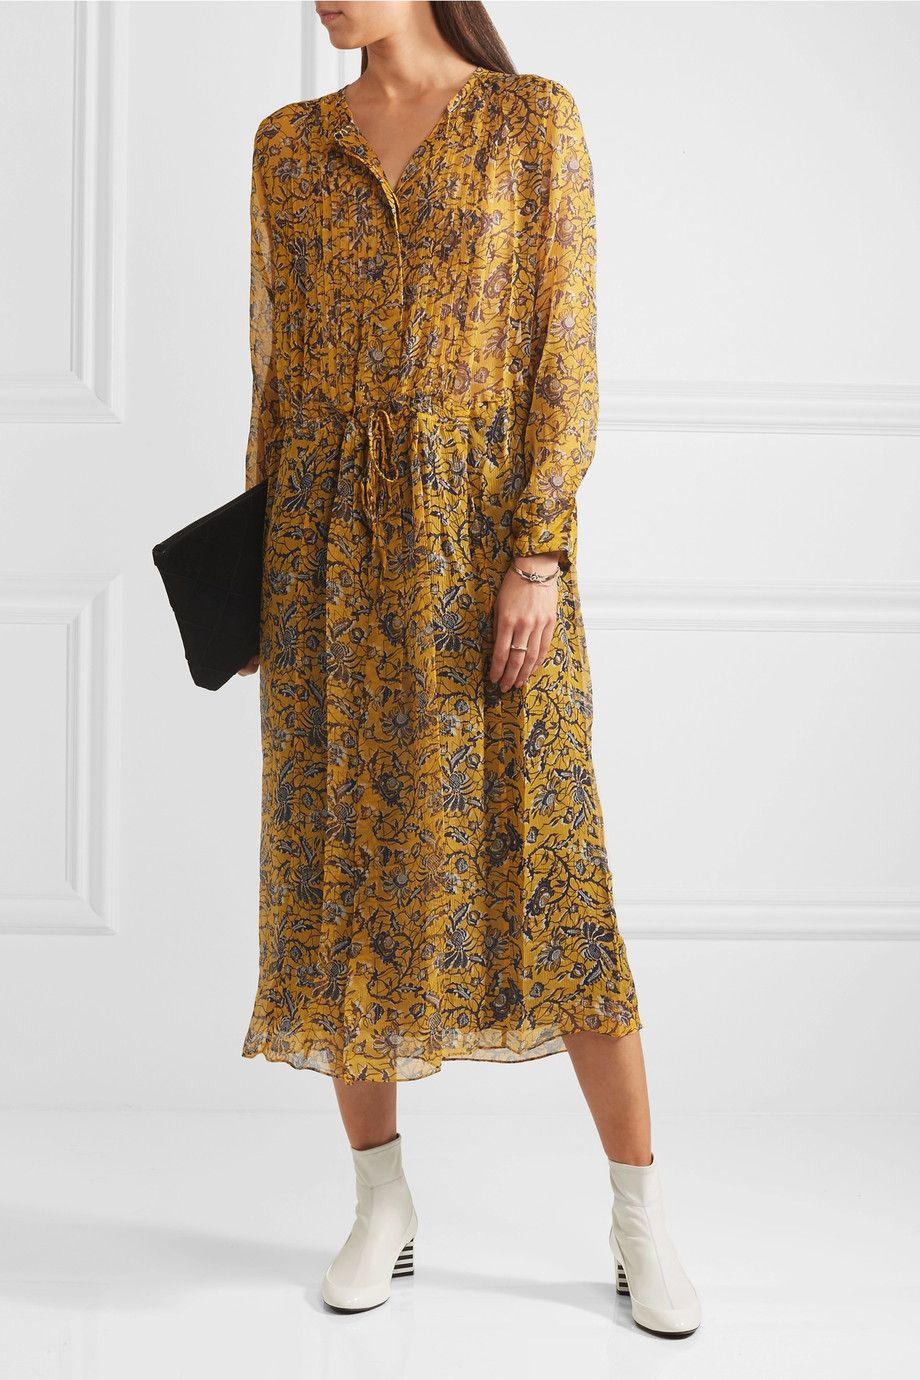 Étoile Isabel Marant | Baphir printed silk midi dress | NET-A-PORTER.COM